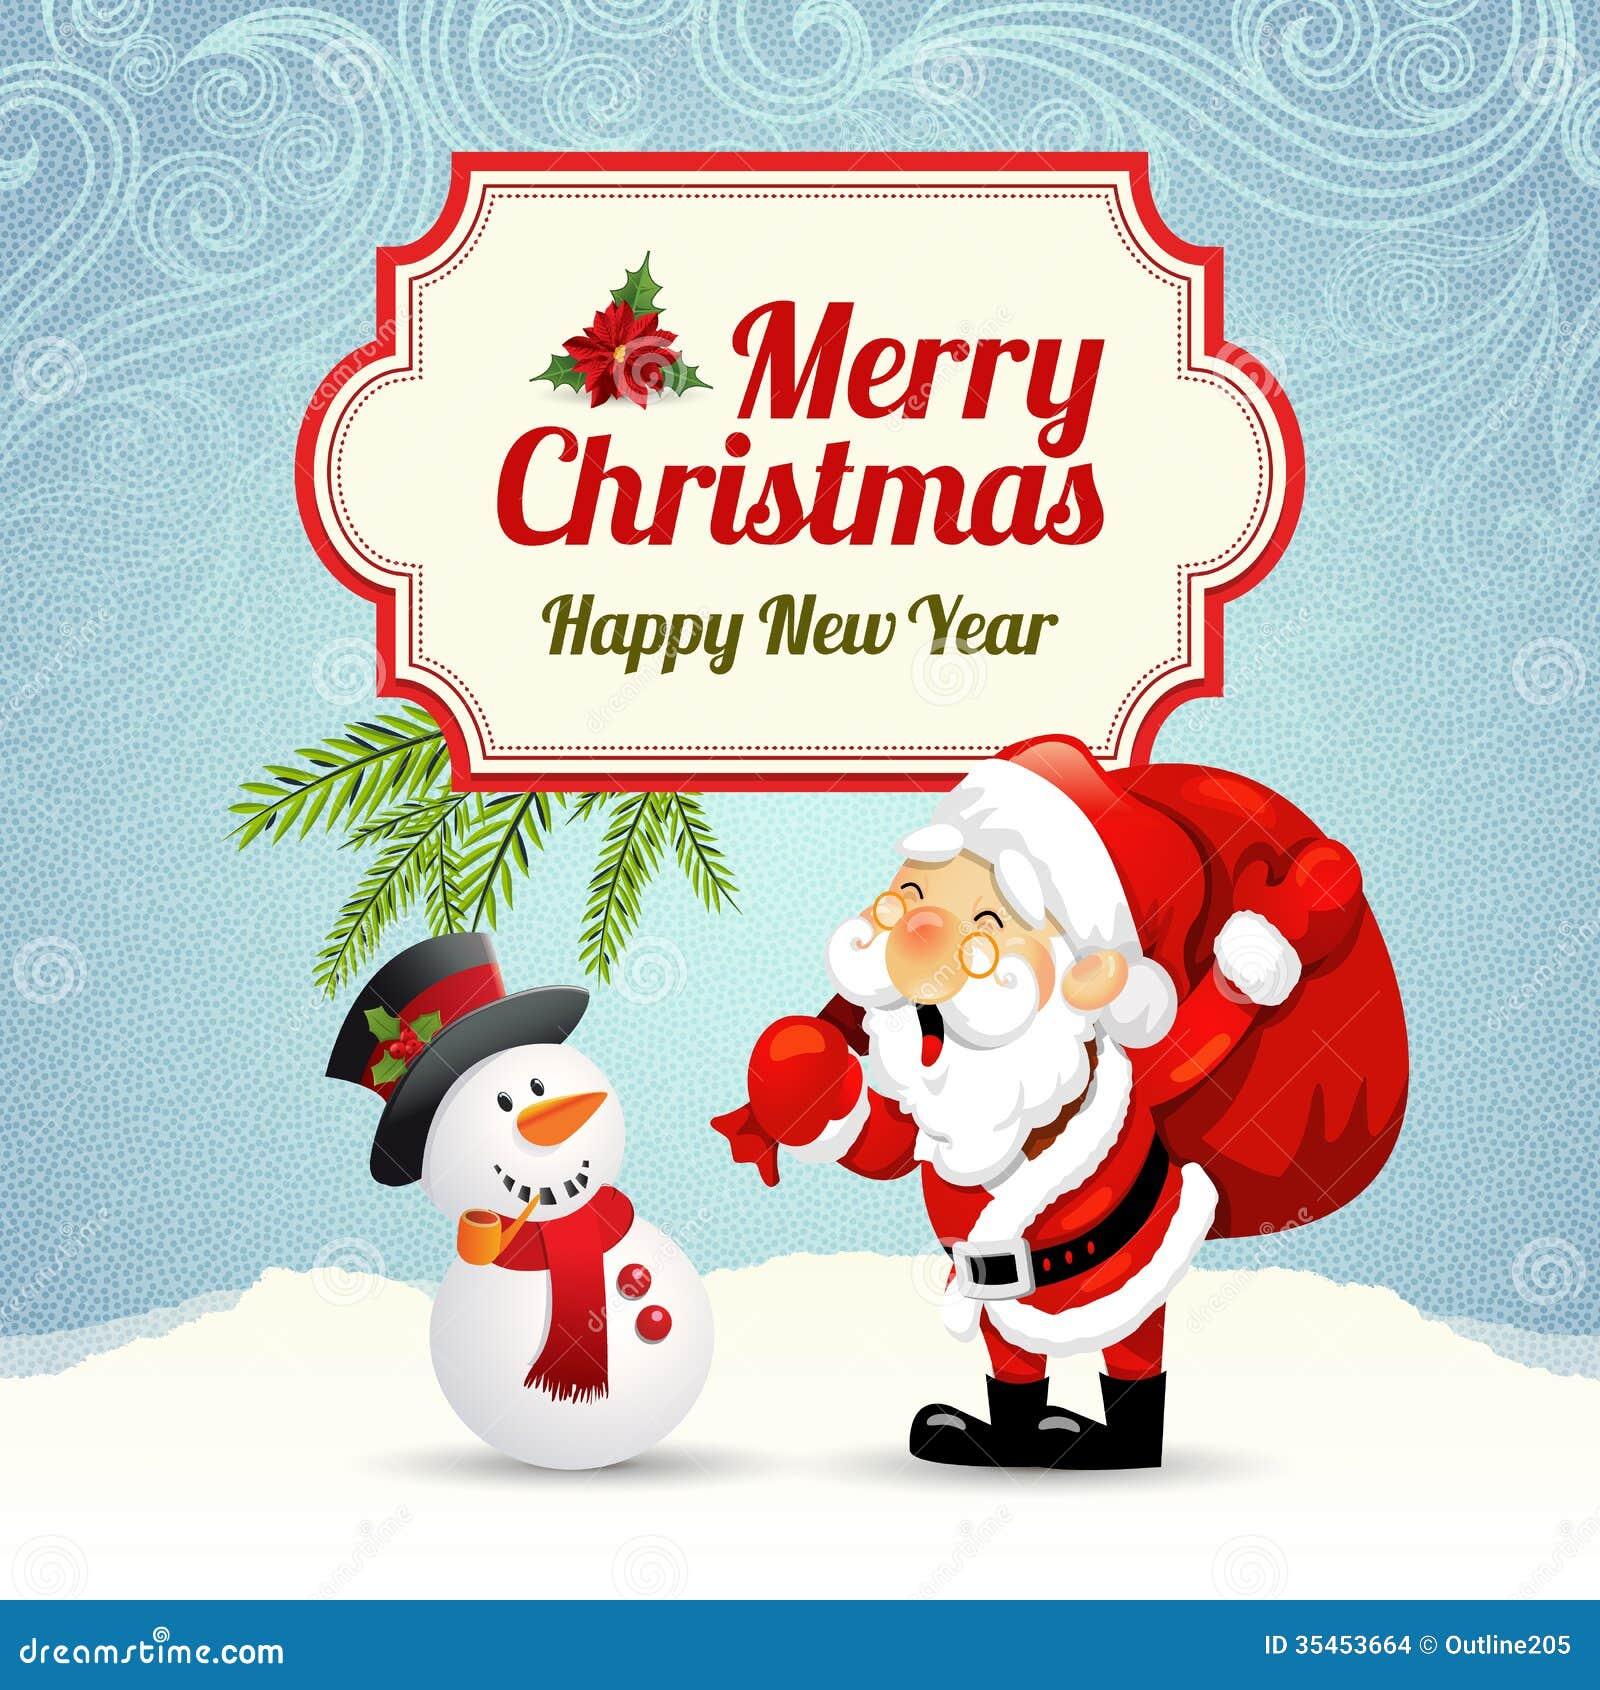 christmas card - Santa Claus Christmas Cards